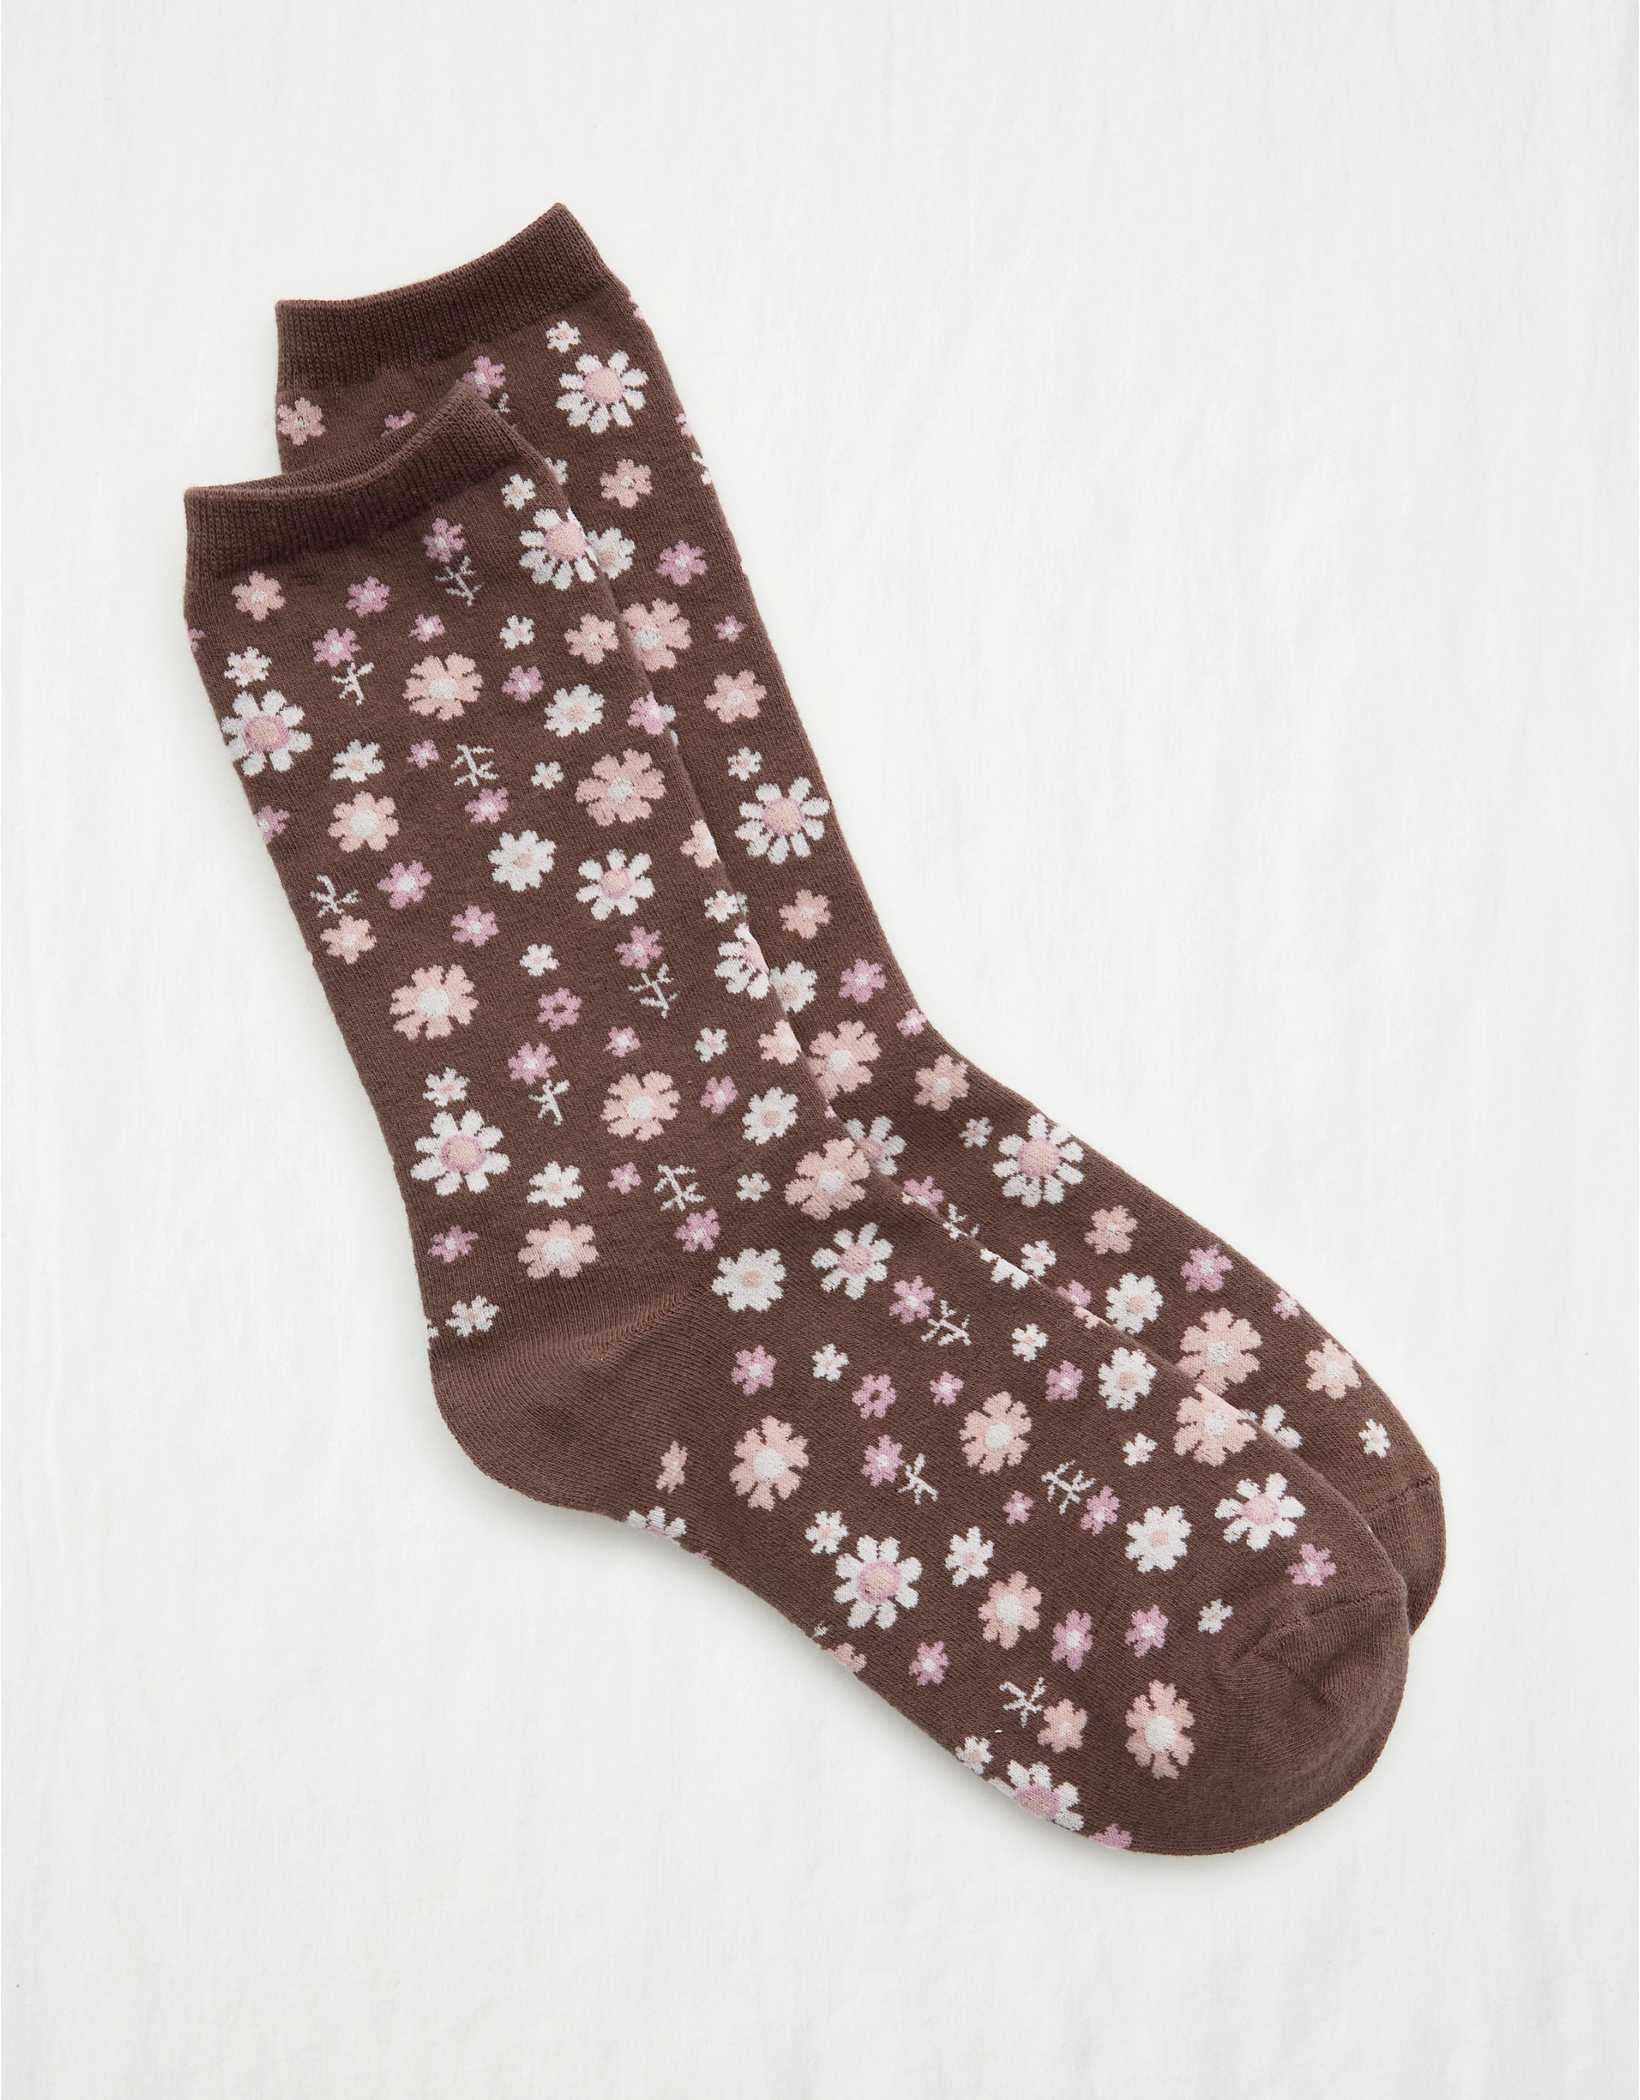 Aerie Floral Crew Socks